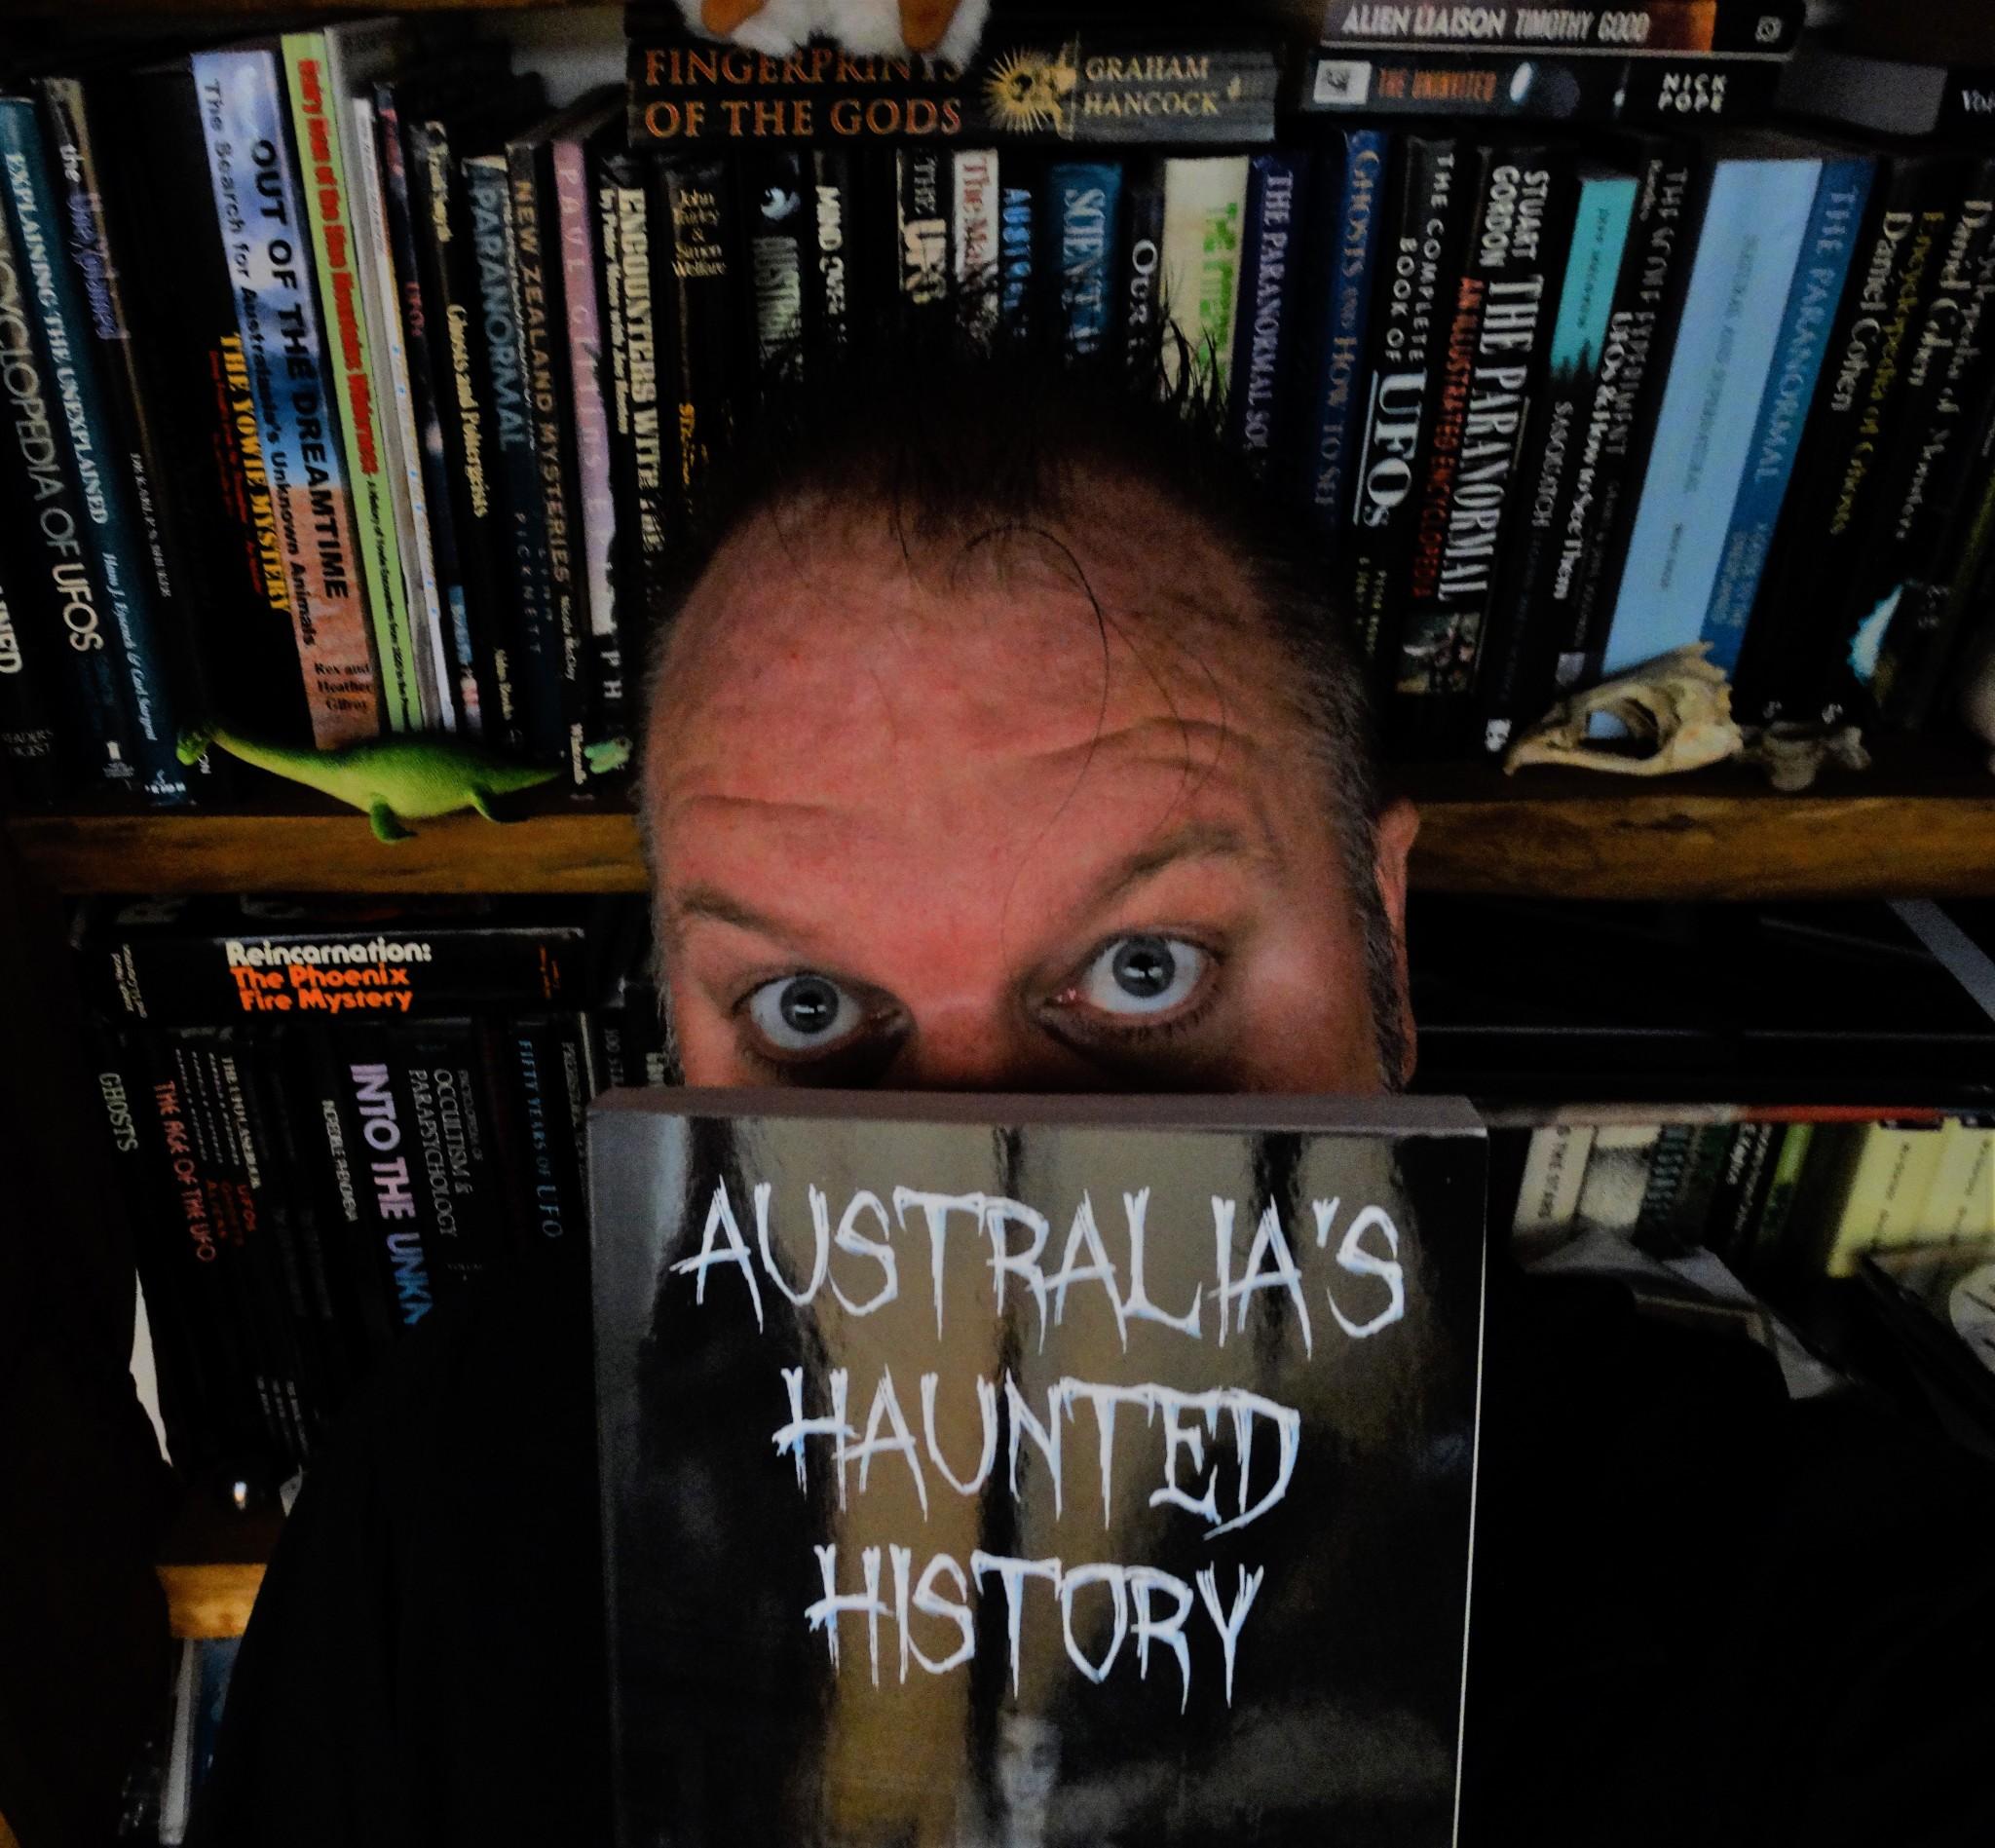 [Book] Australia's Haunted History – By Jeanette Kamper